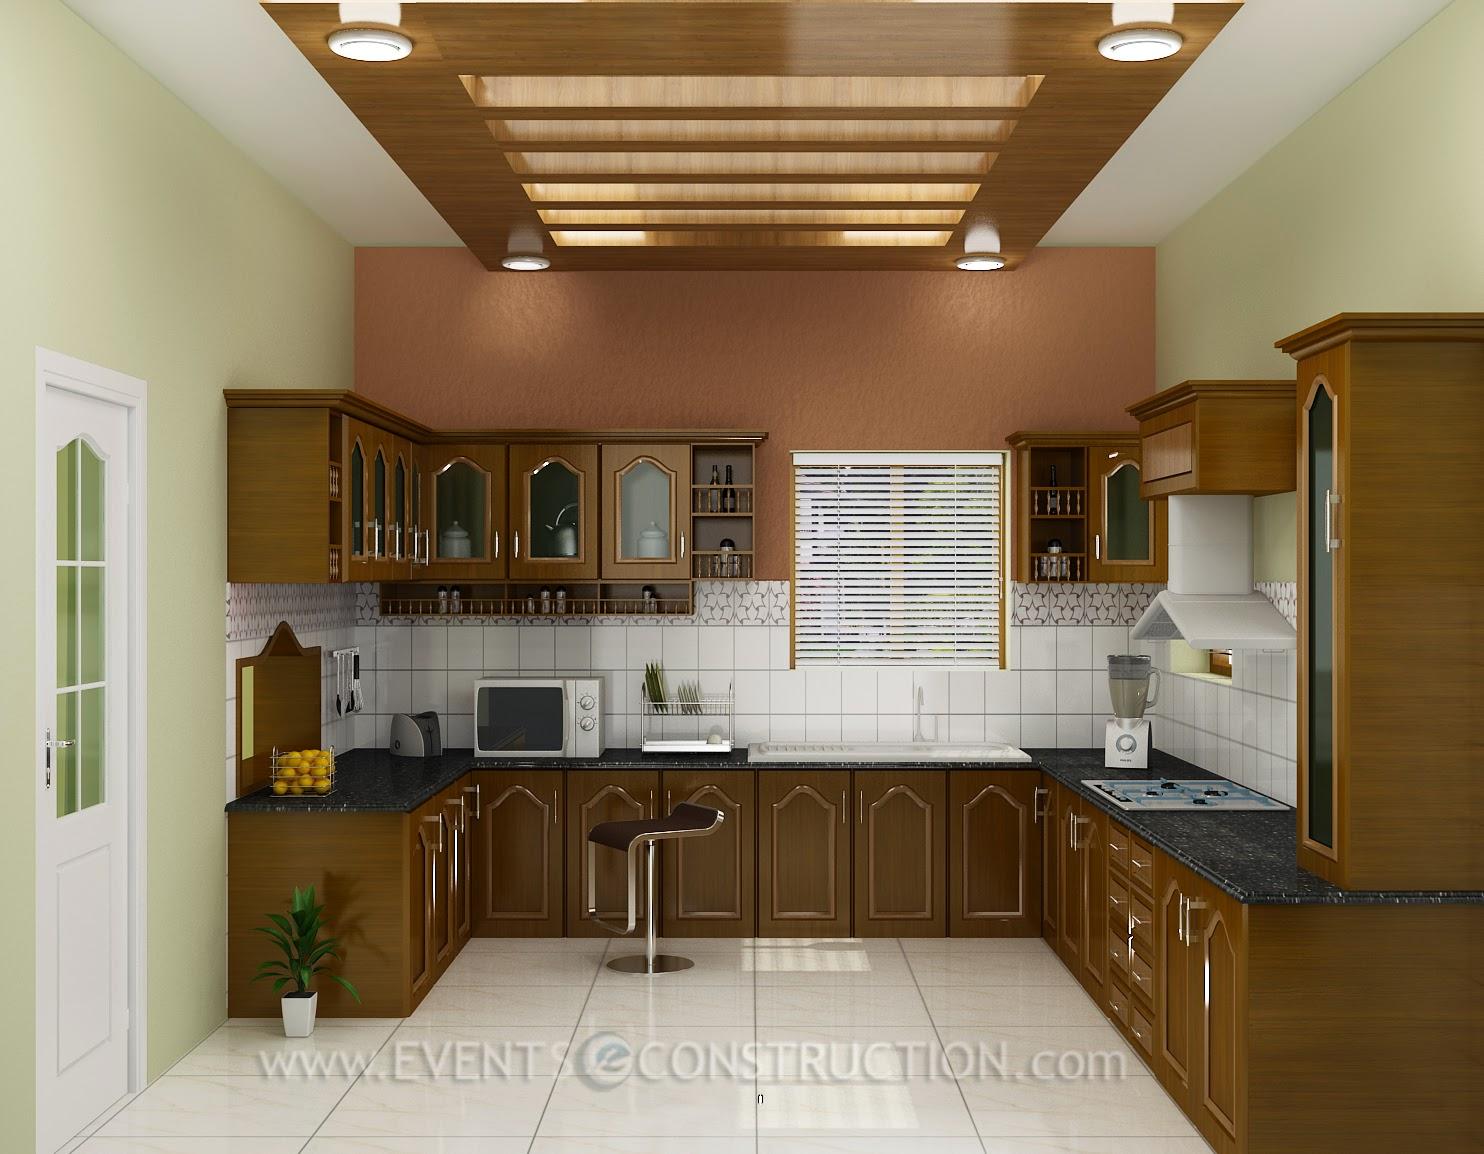 Evens Construction Pvt Ltd Kerala Kitchen Interior Design